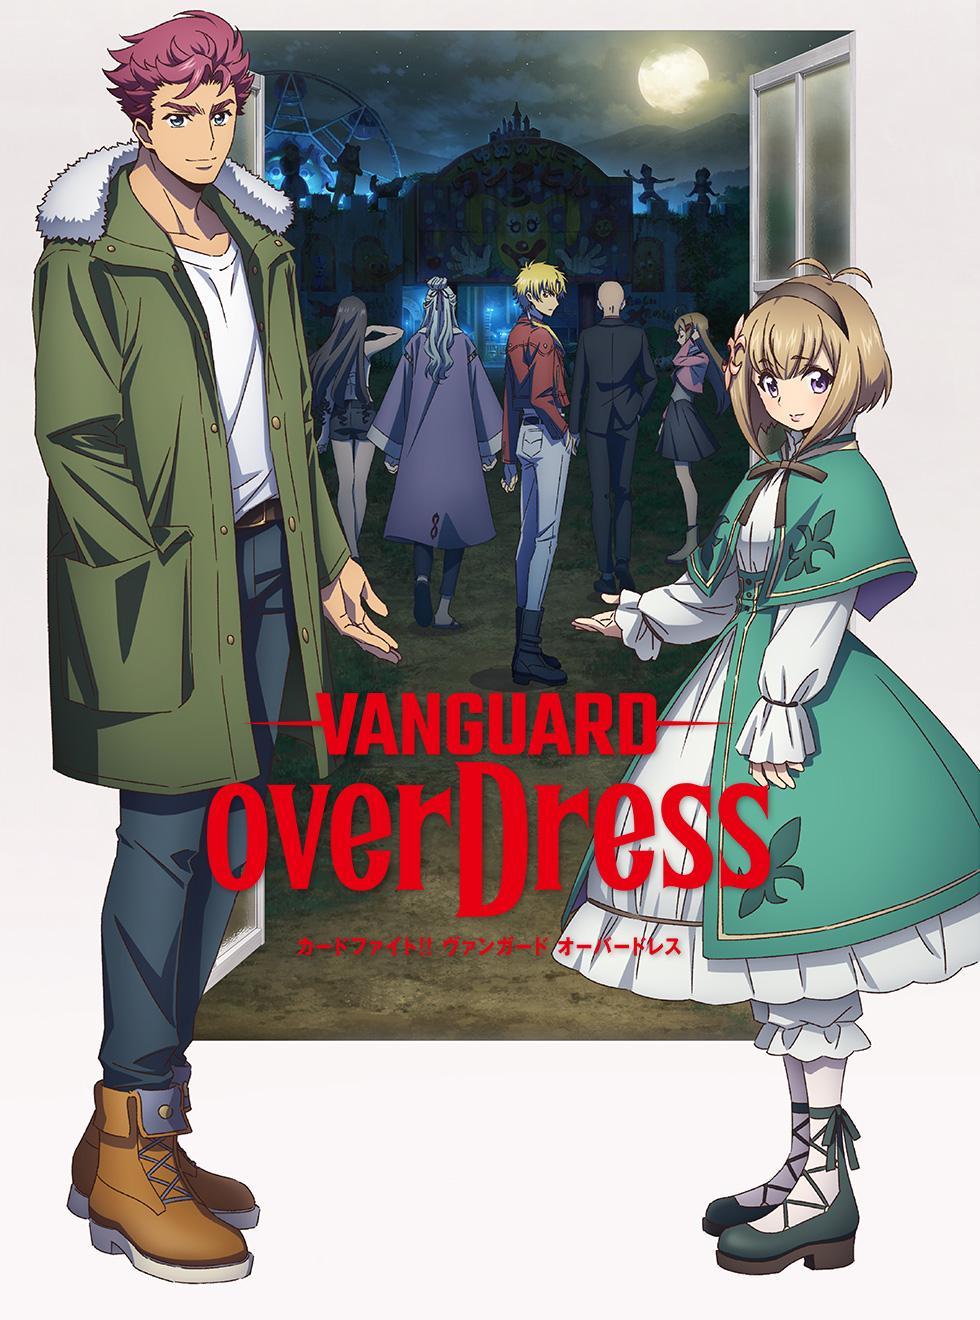 Cardfight!! Vanguard overDress ตอนที่ 1-4 ซับไทย (ยังไม่จบ)